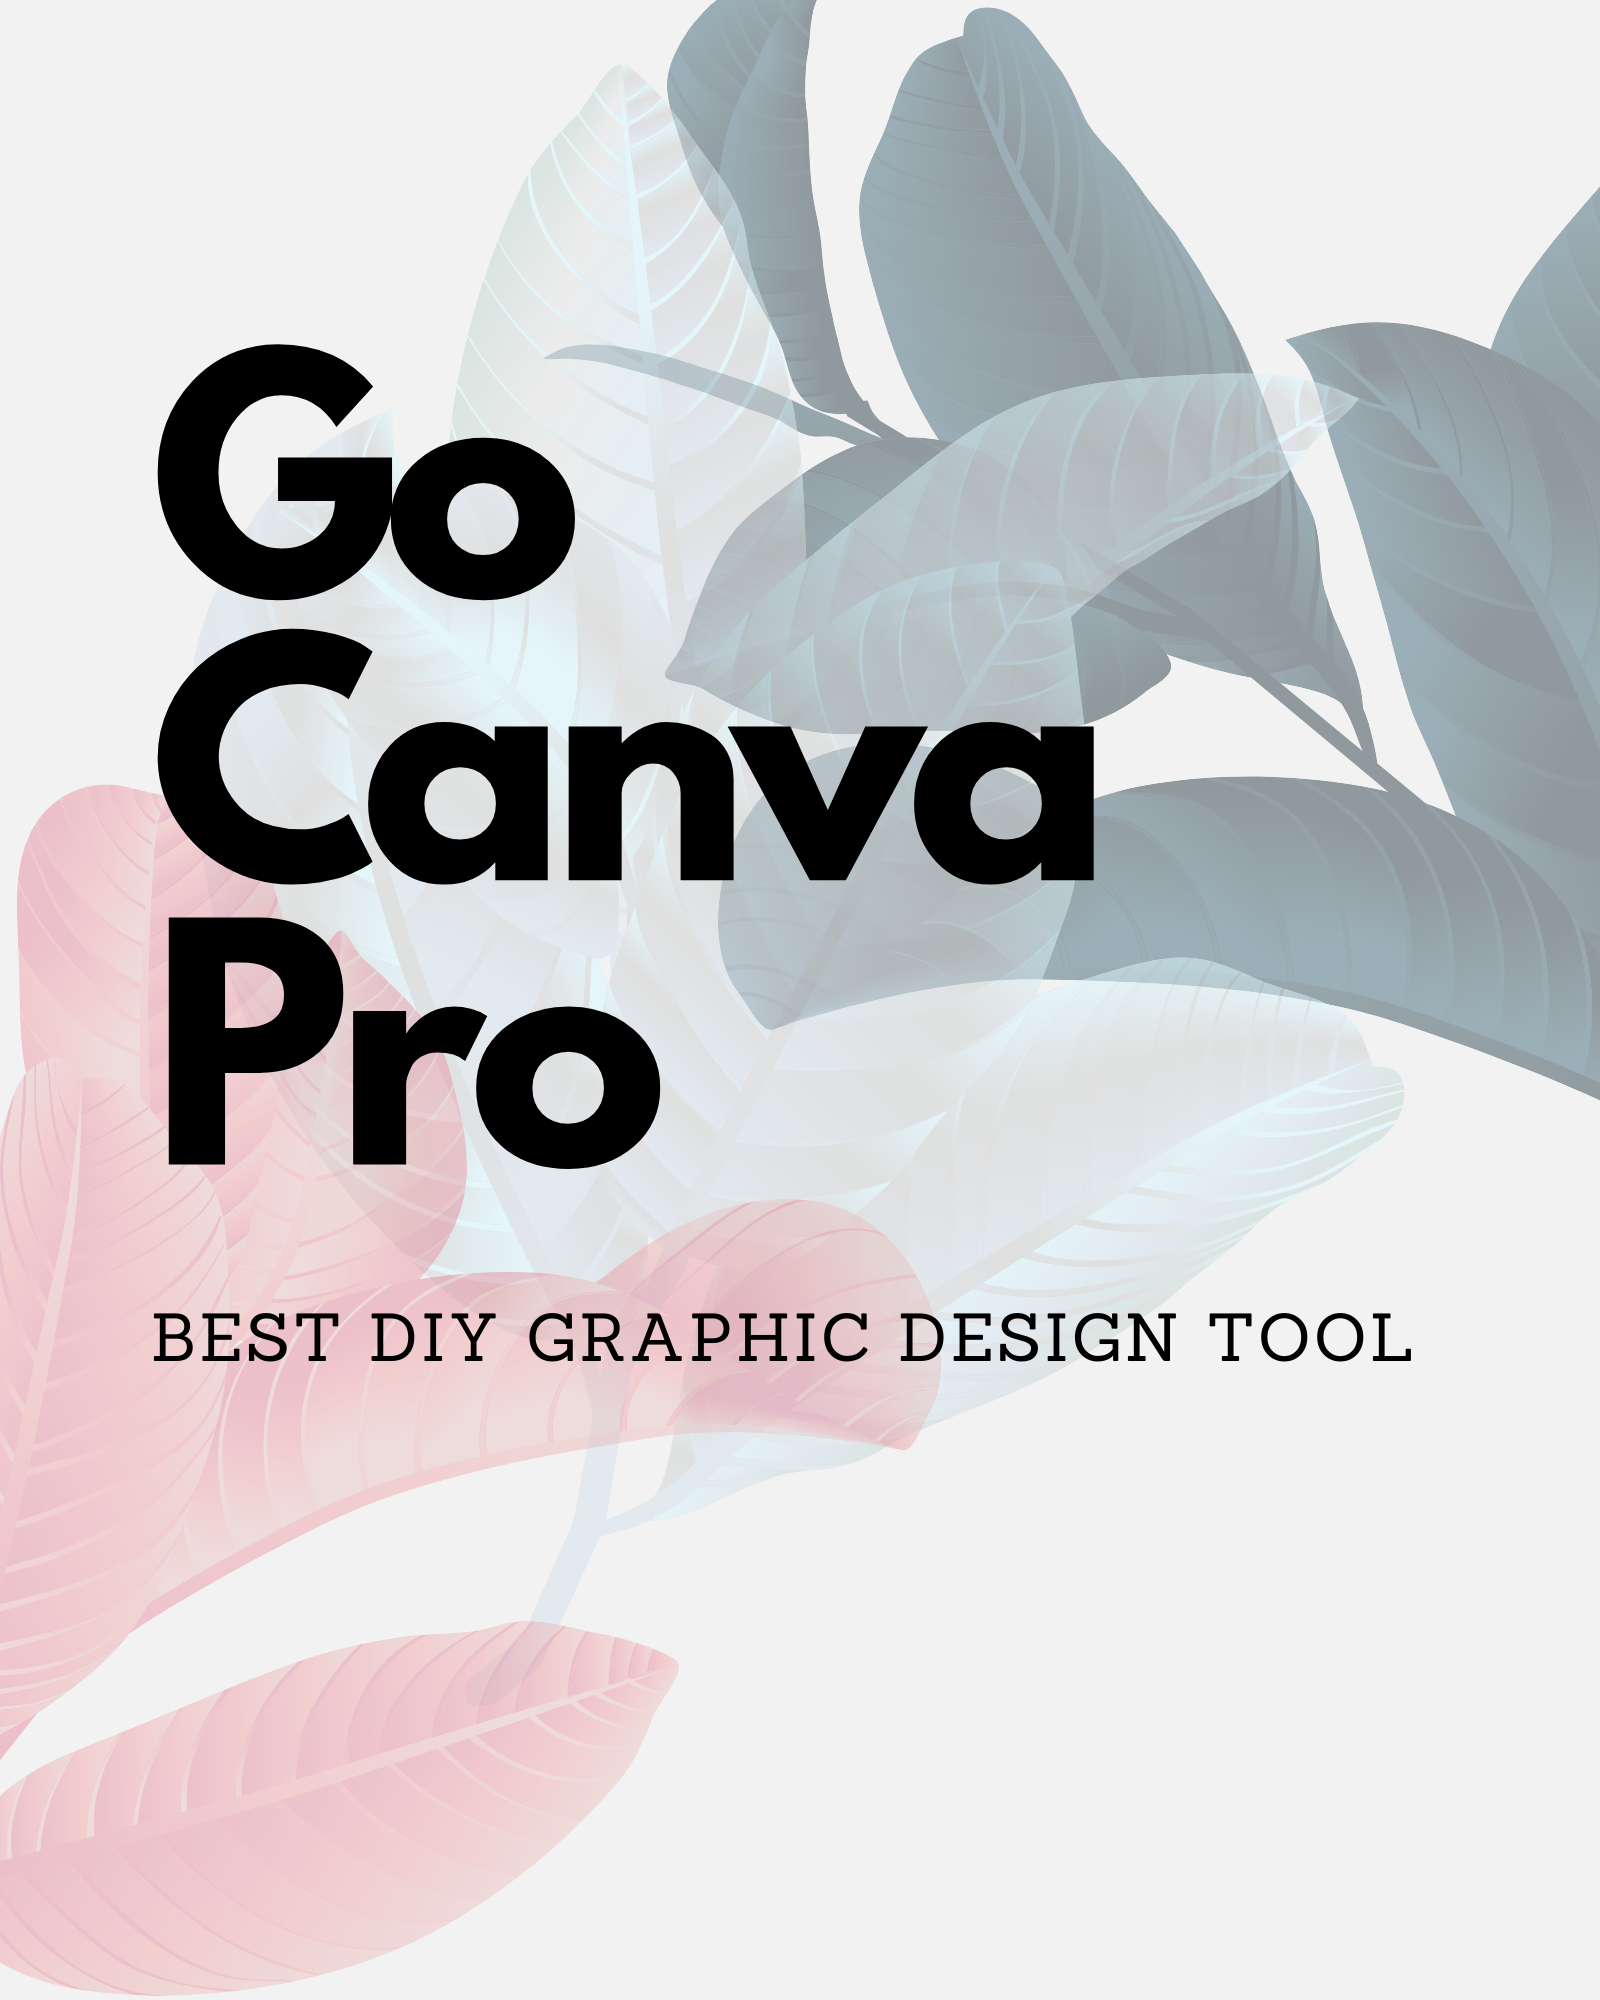 canva pro graphic design app